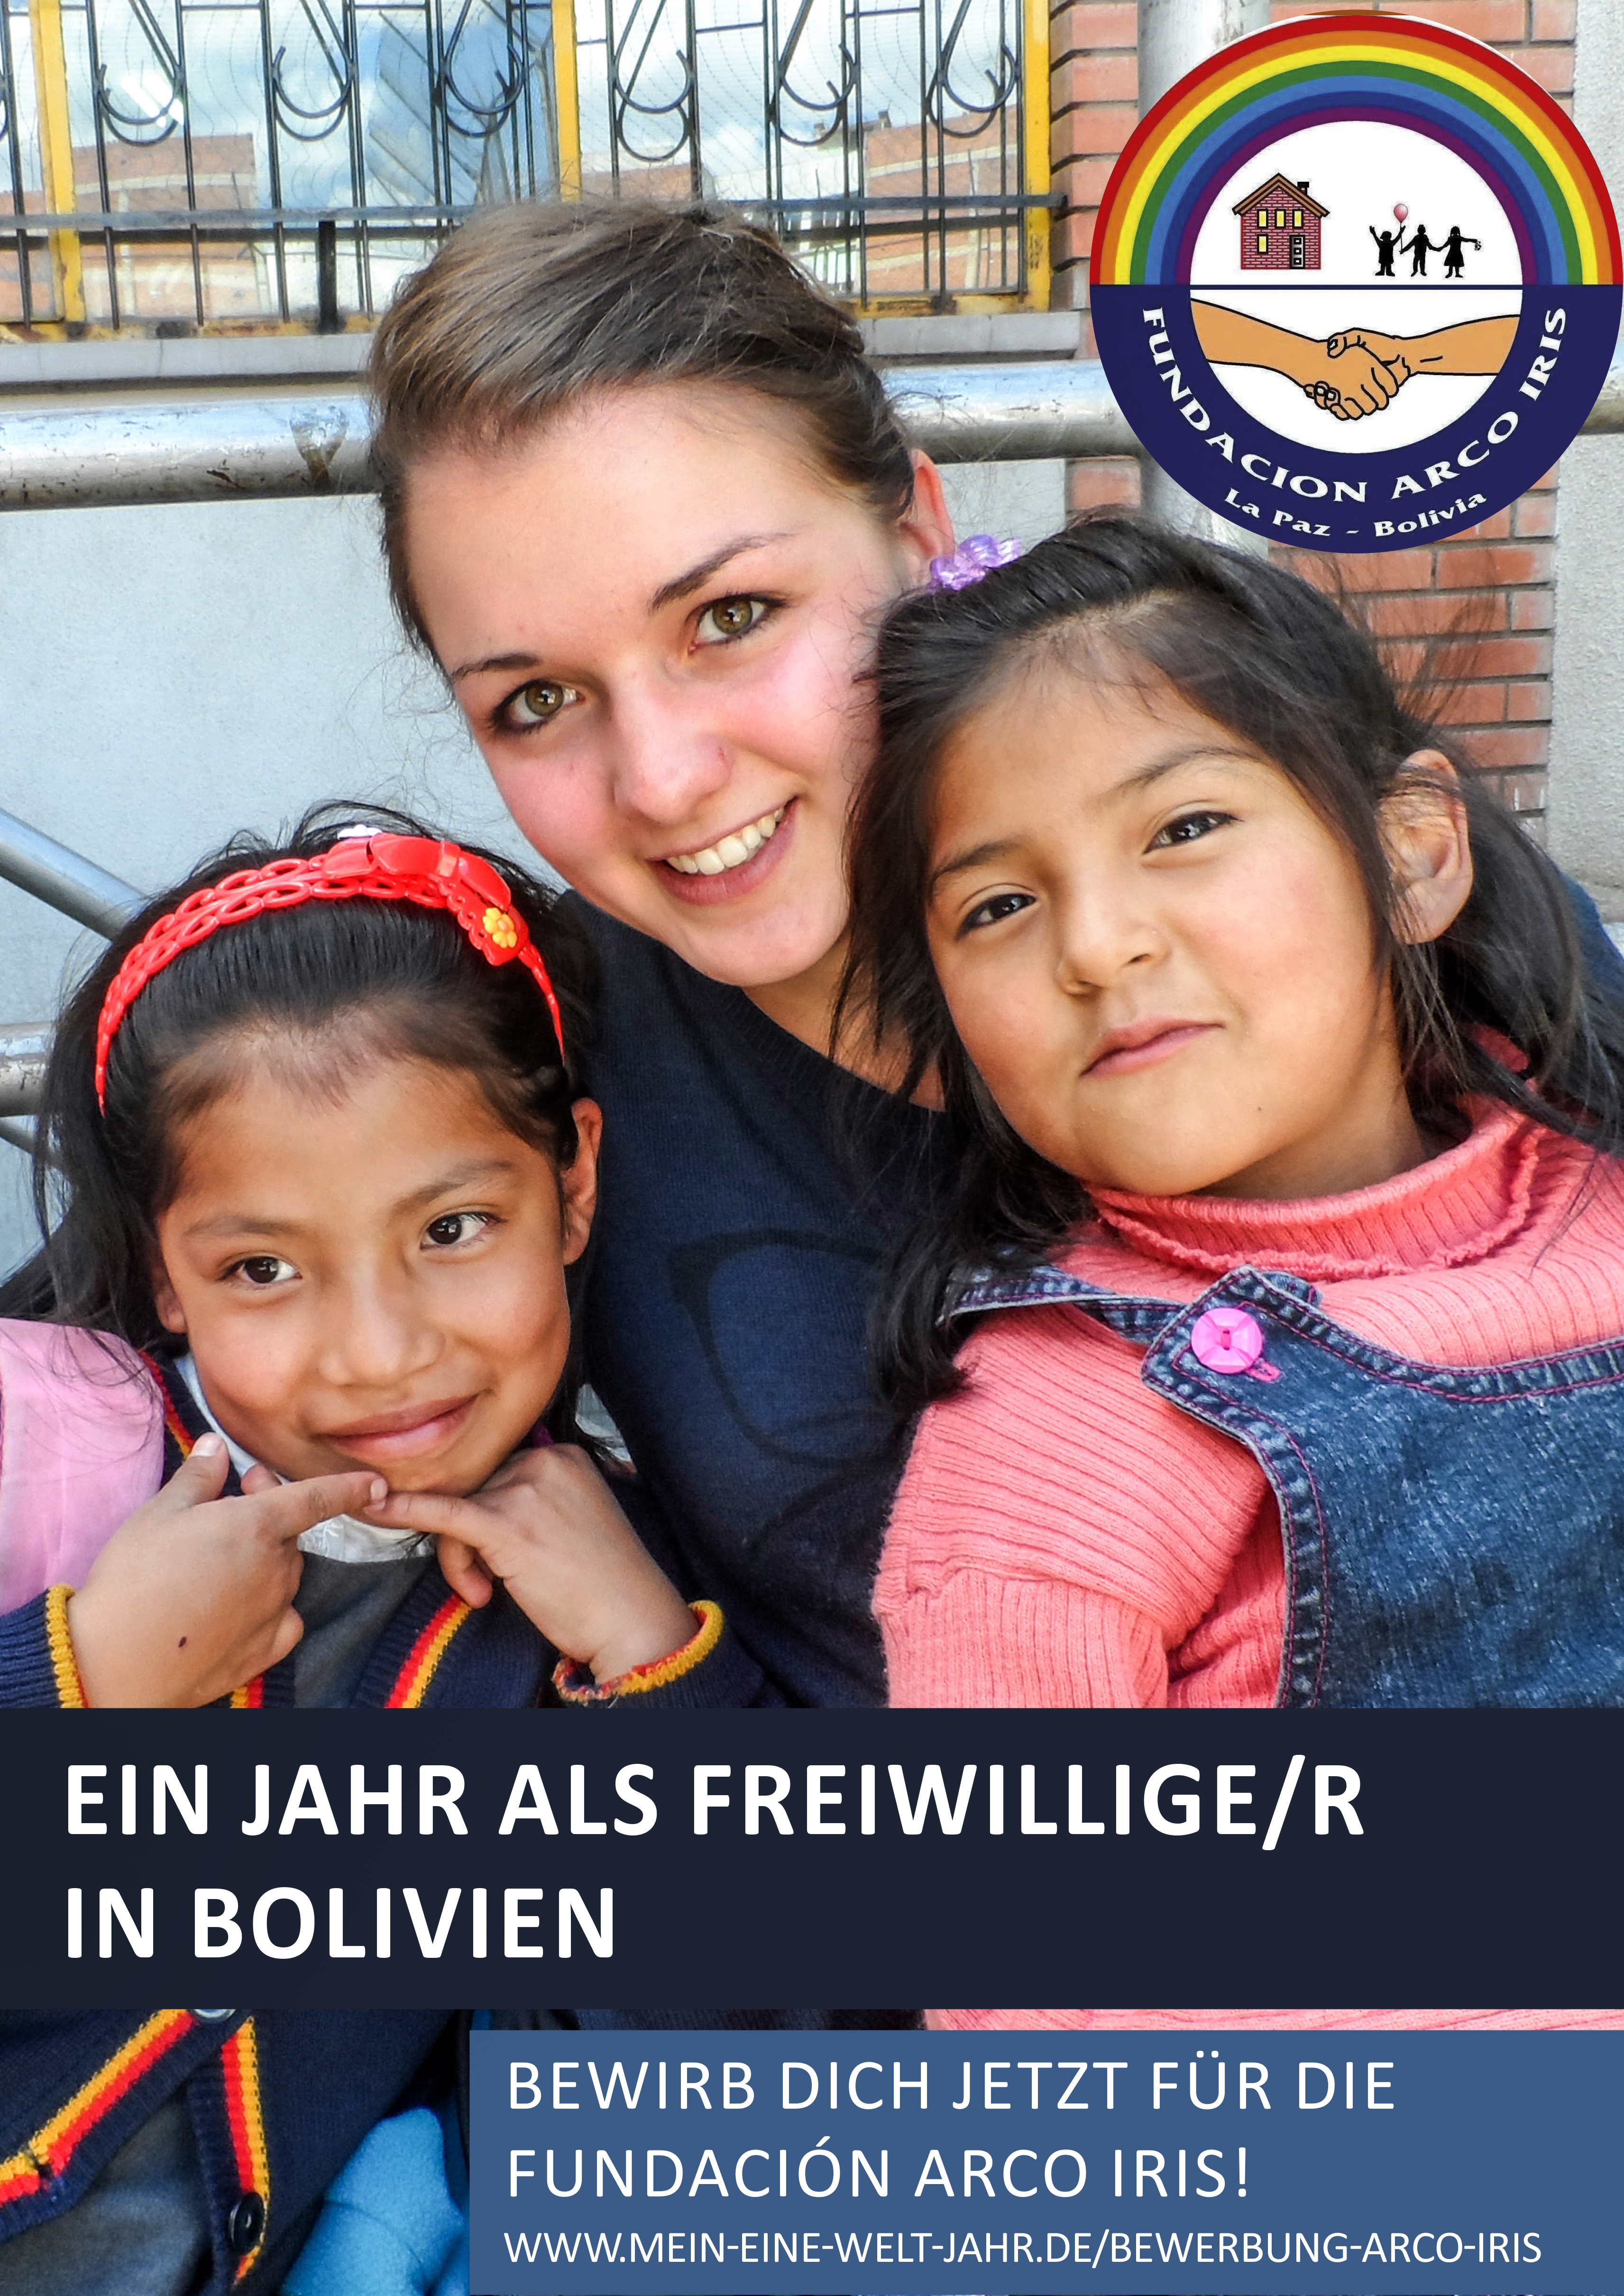 Freiwillige bei der Fundación Arco Iris